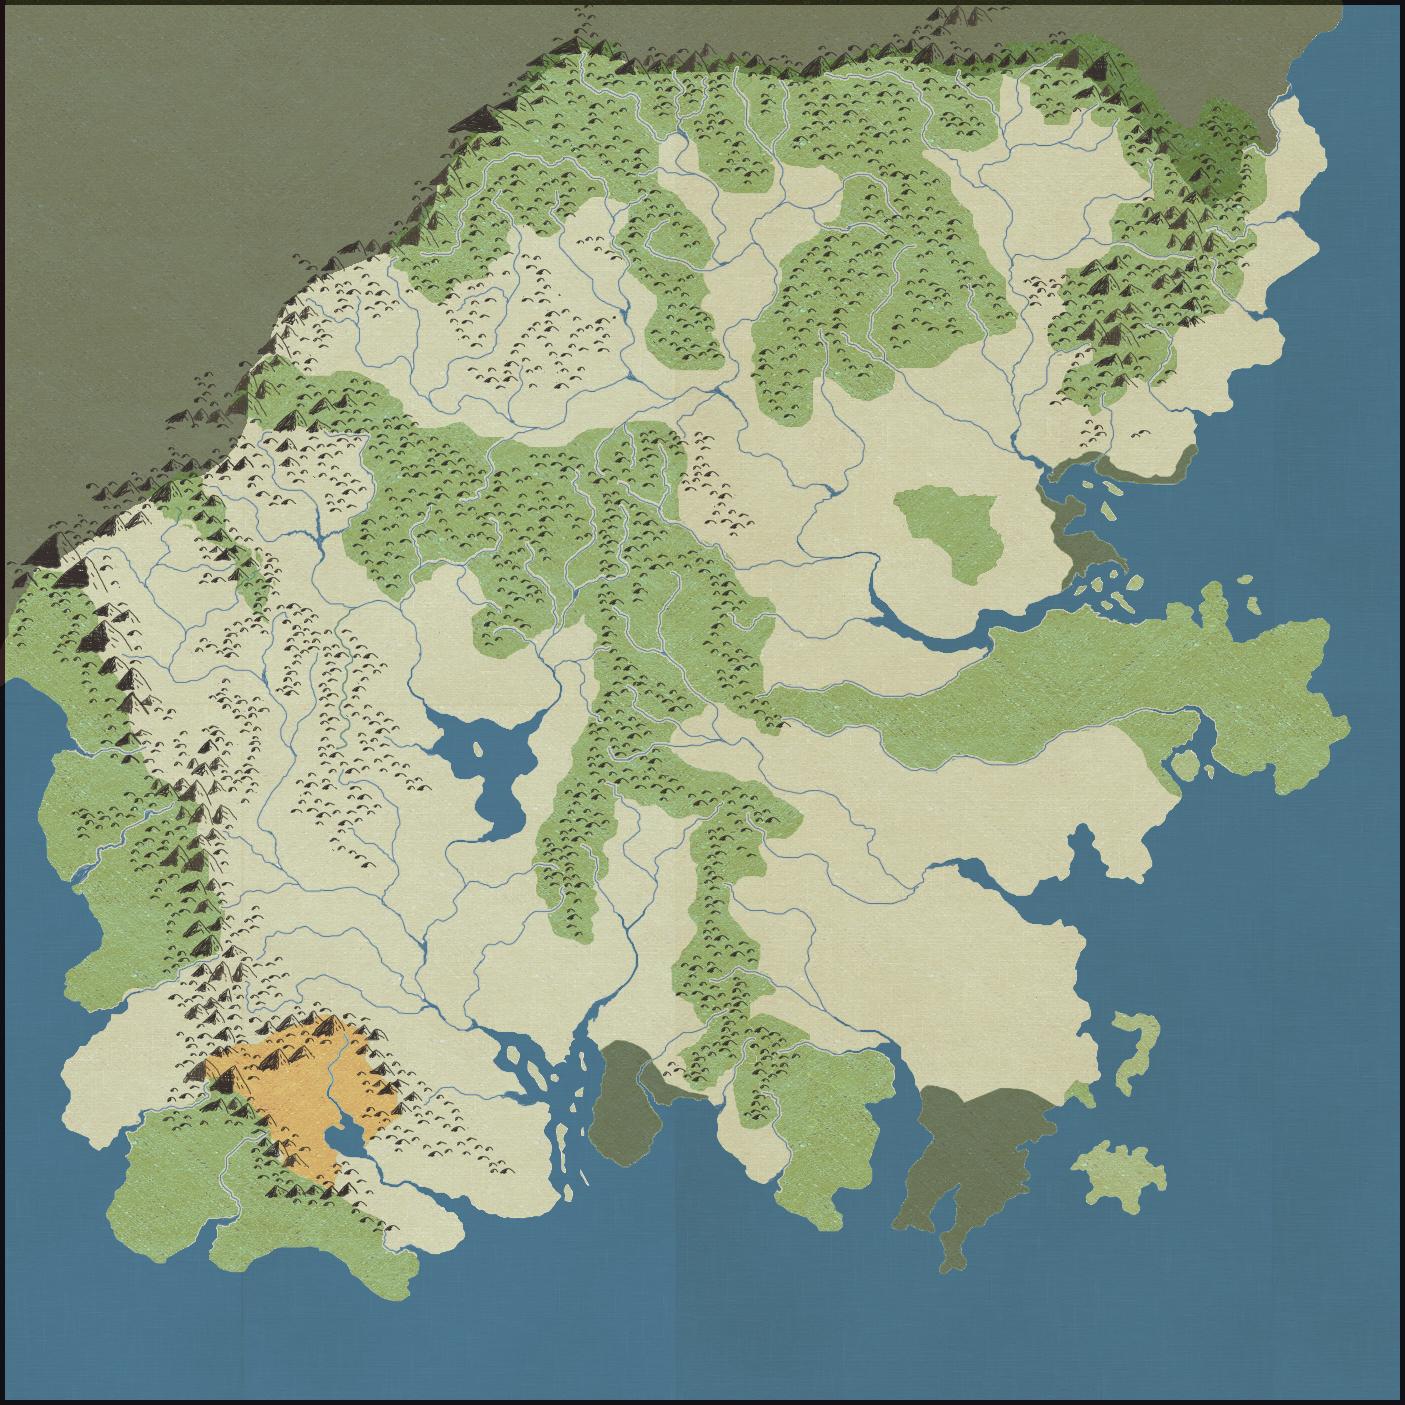 Blank Fantasy World Map Timekeeperwatches - World map blank jpg